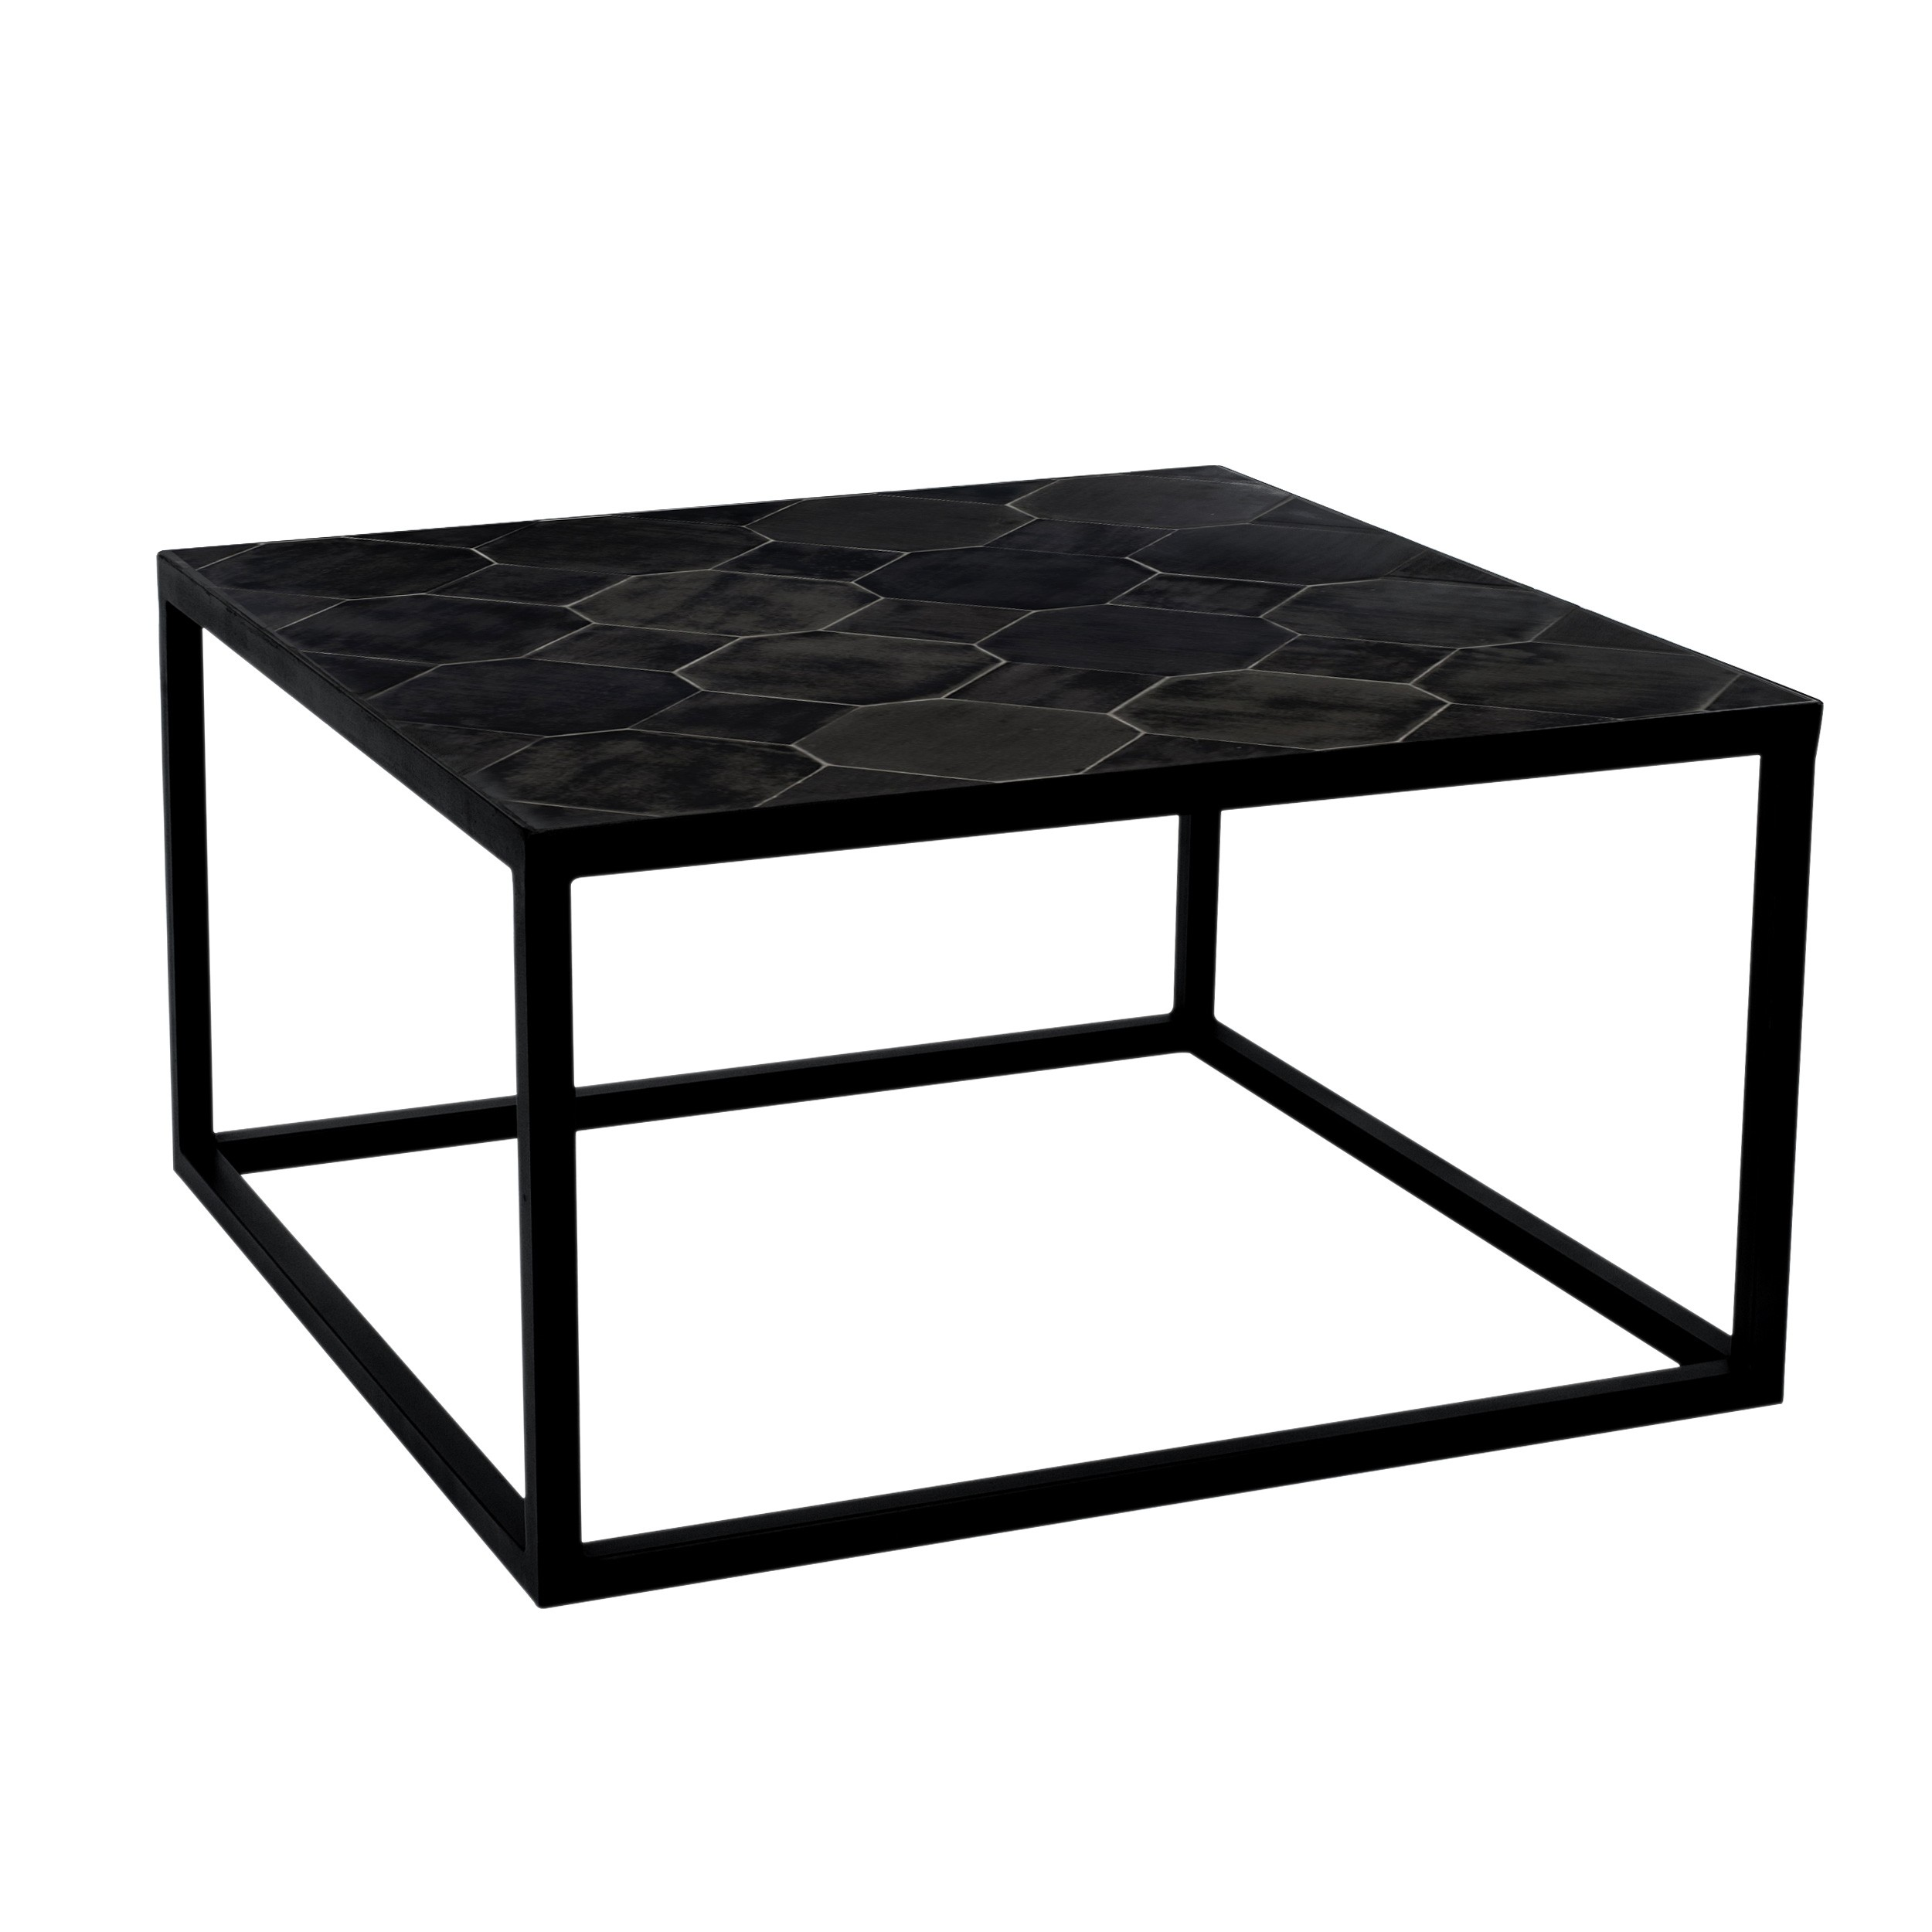 acheter table basse carree pieds metal